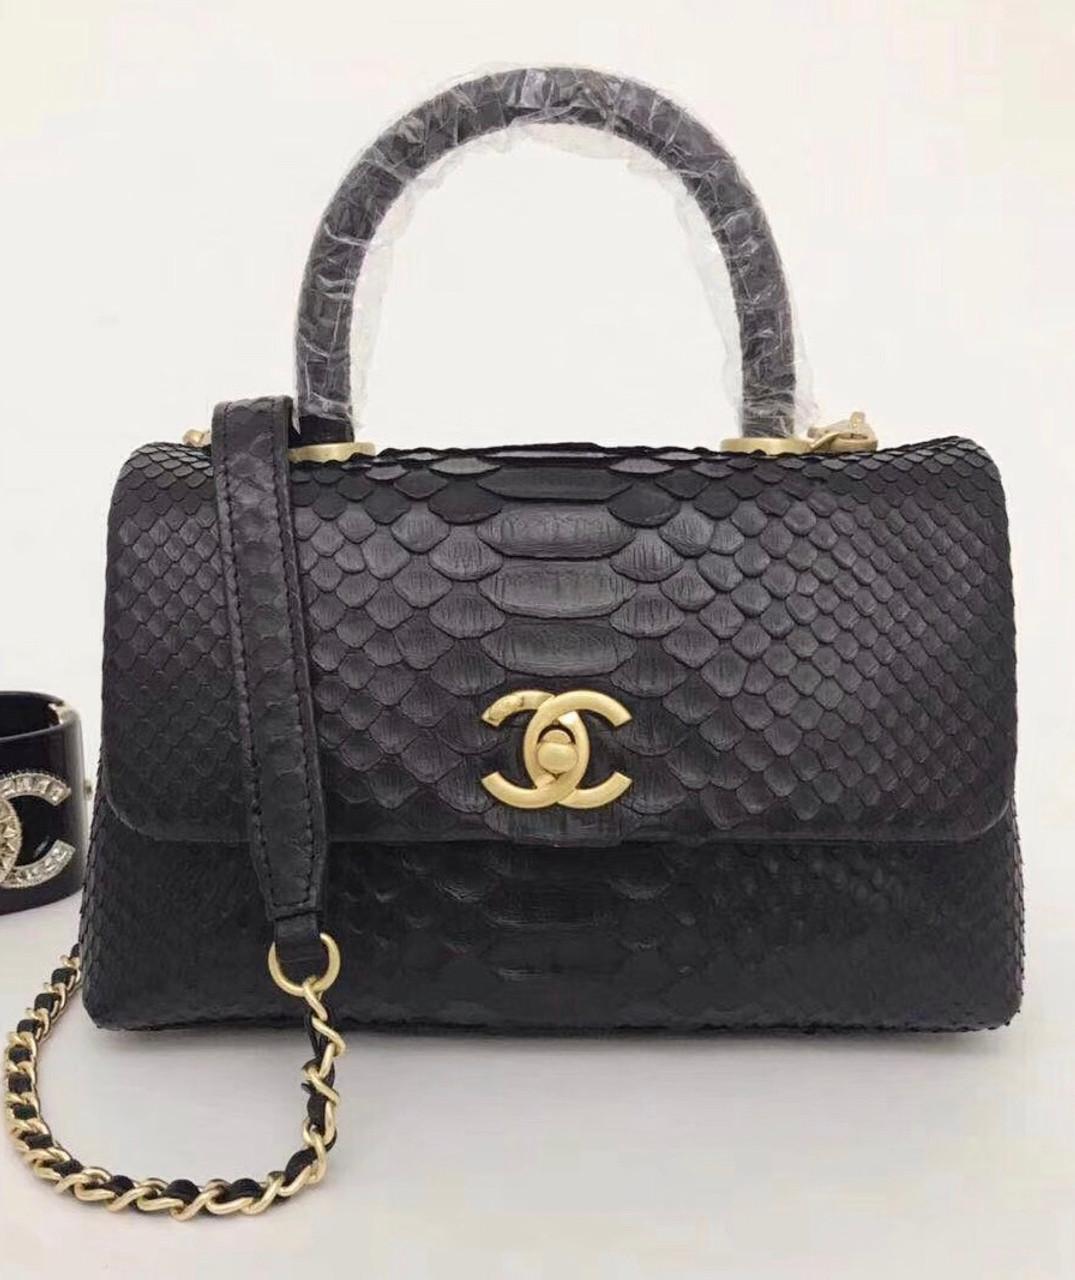 8087304bb11b Chanel Small Black Python Flap Bag With Top Handle - Bella Vita Moda